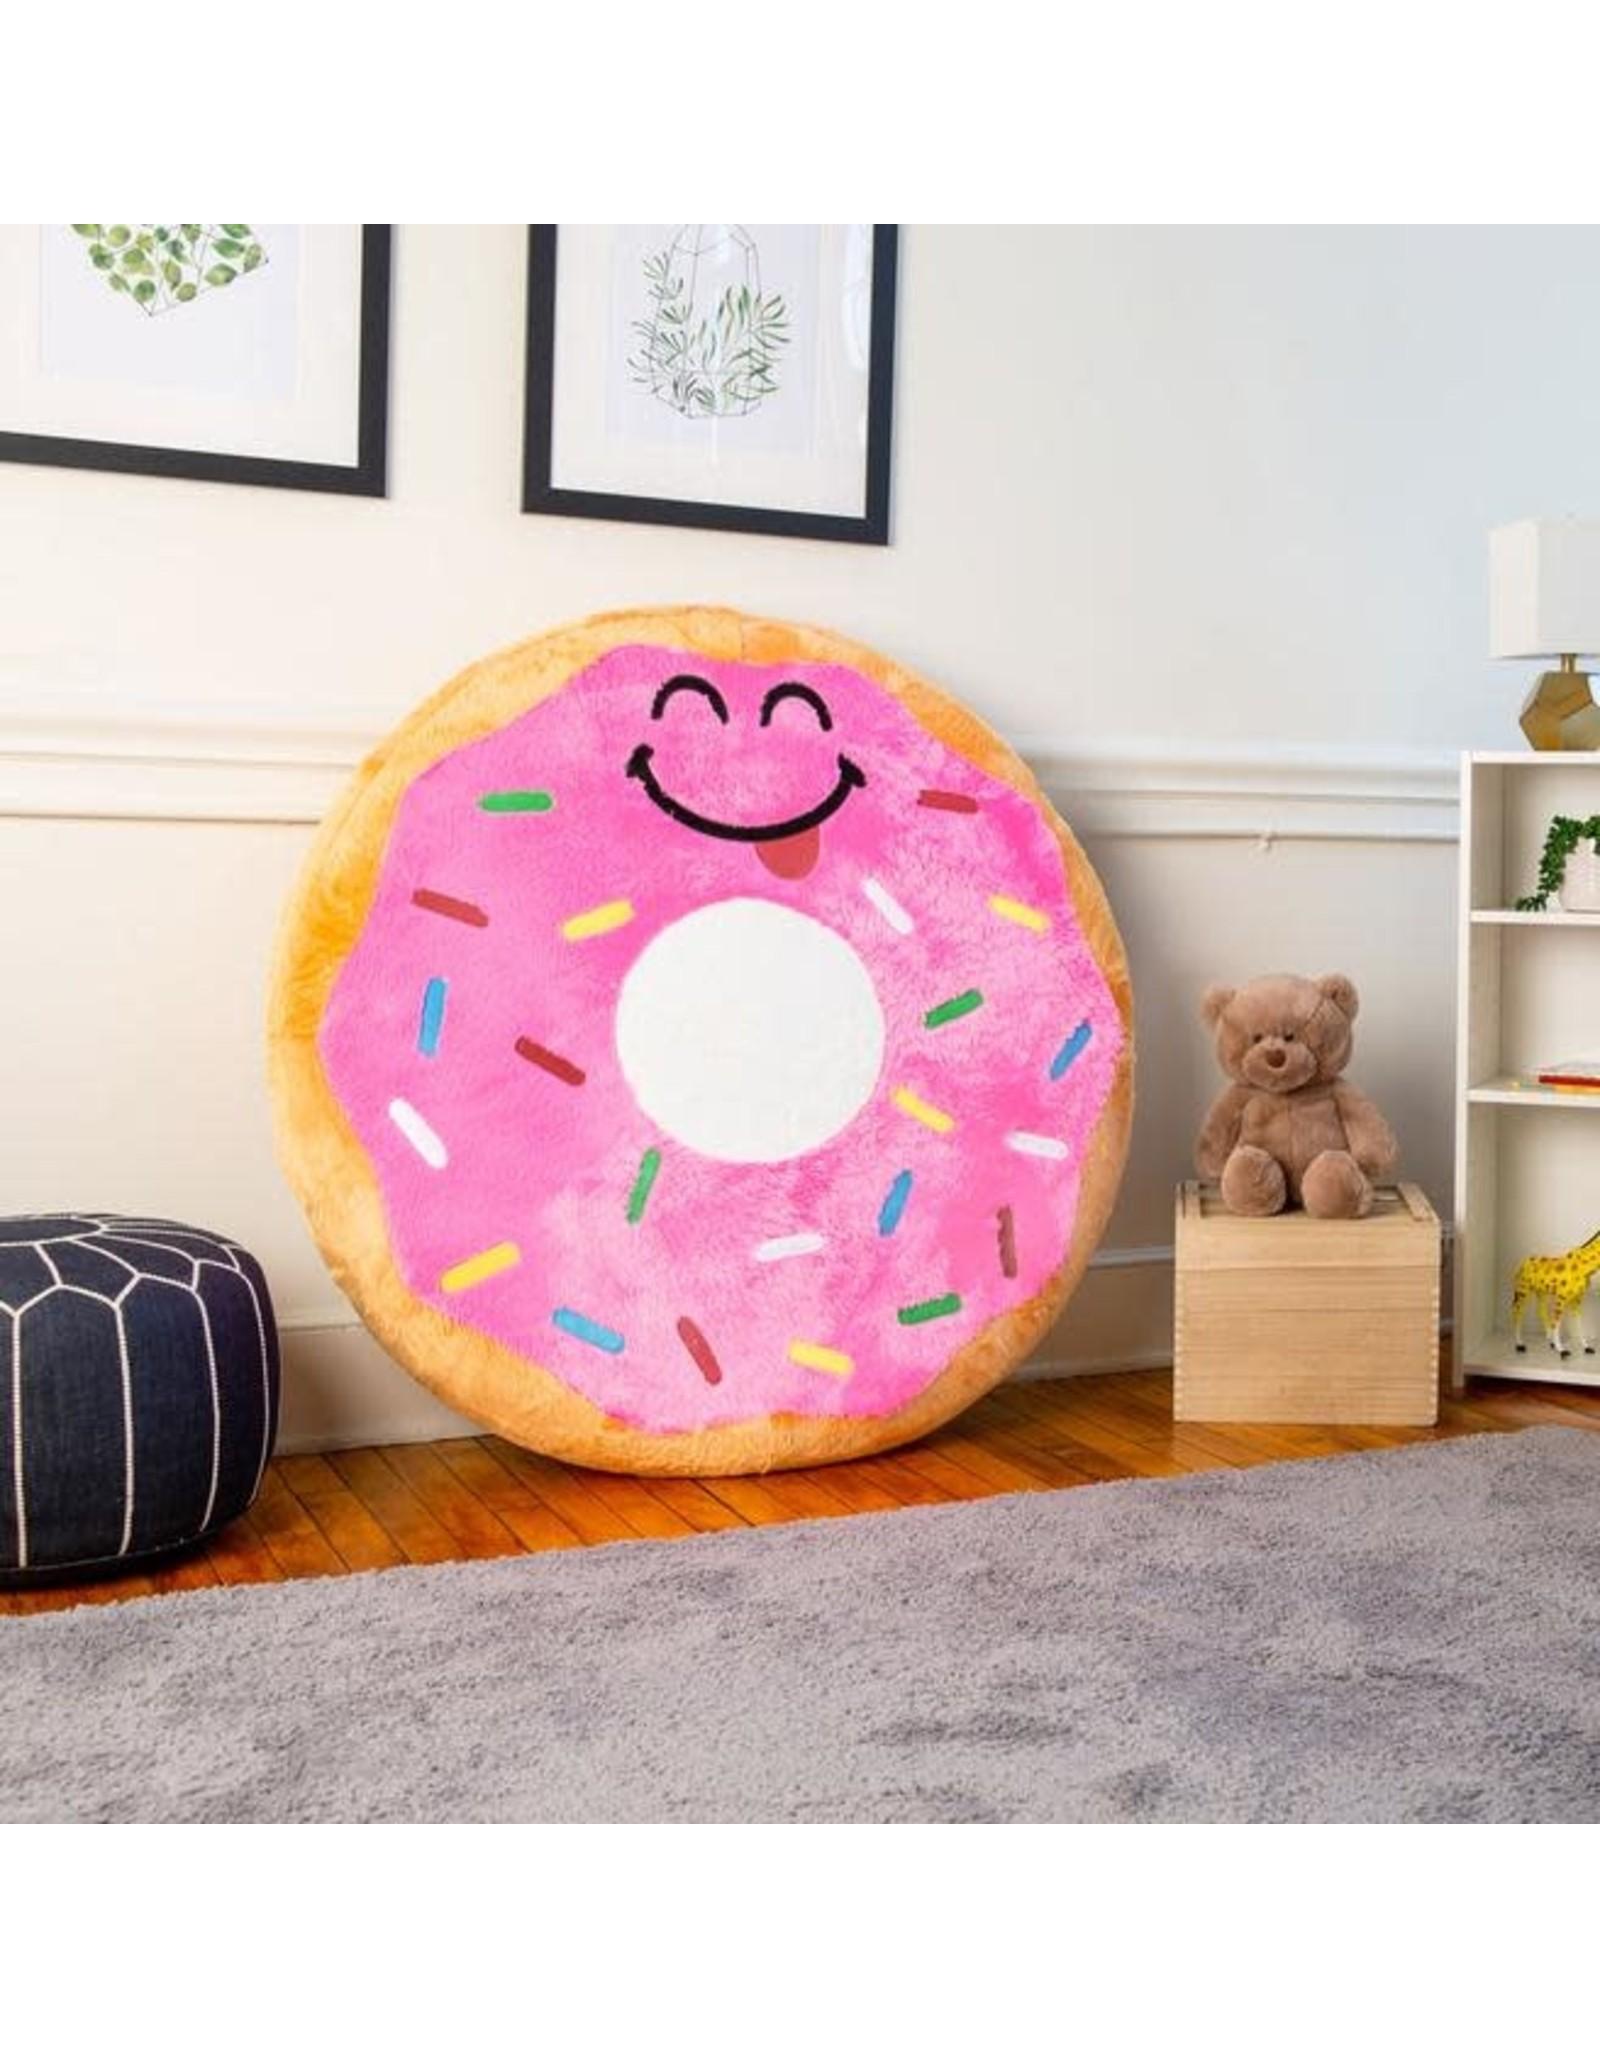 Good Banana Floor Floatie Playspace Cushion, Donut